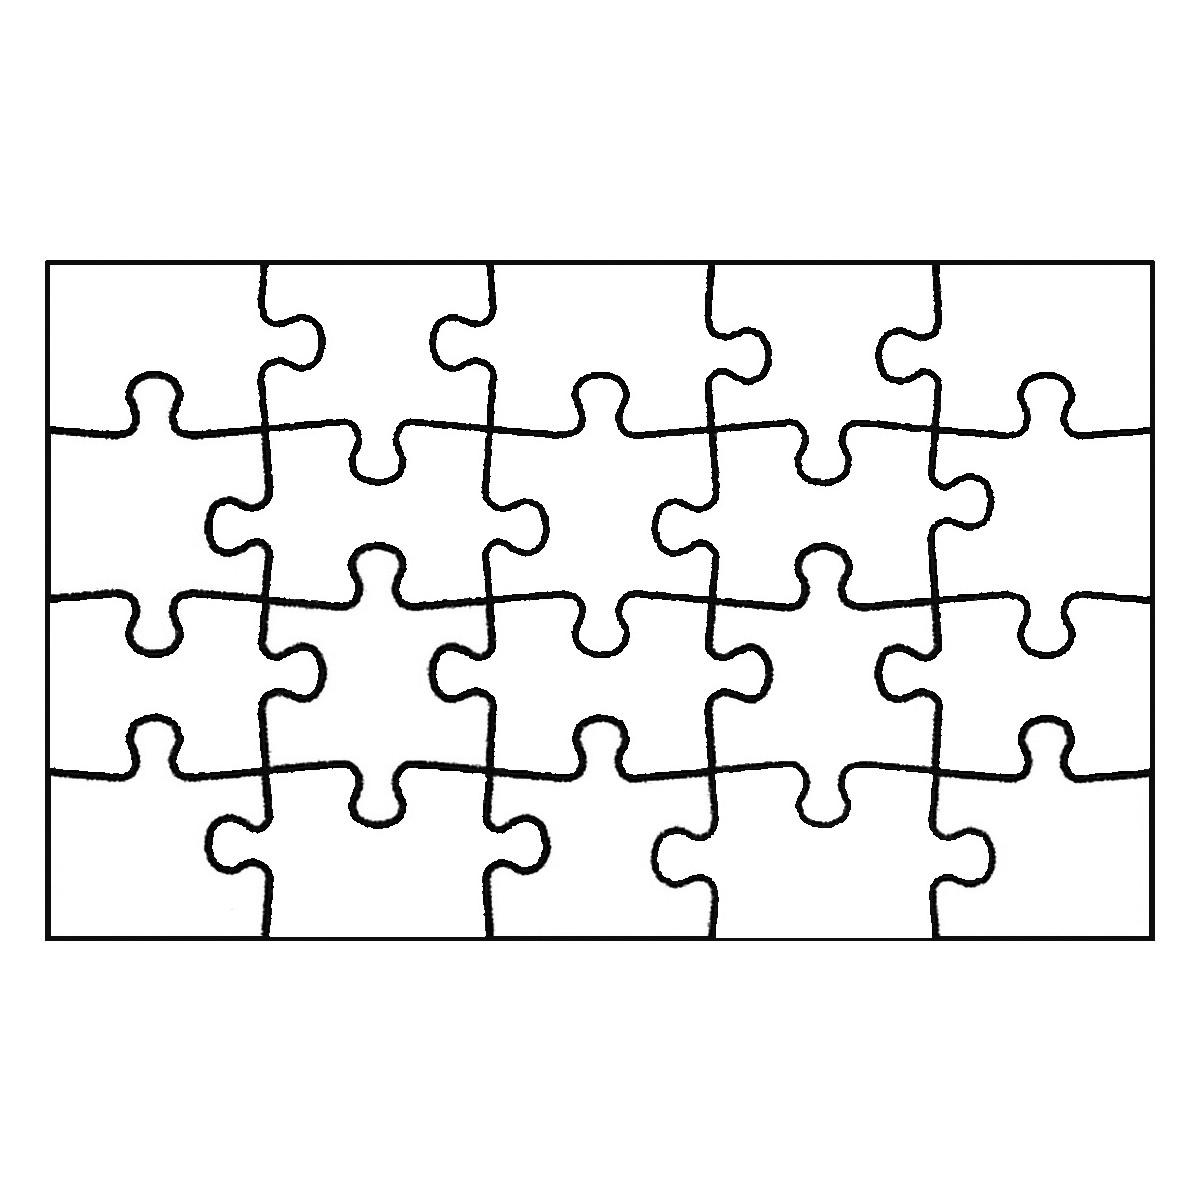 puzzle 24 teile